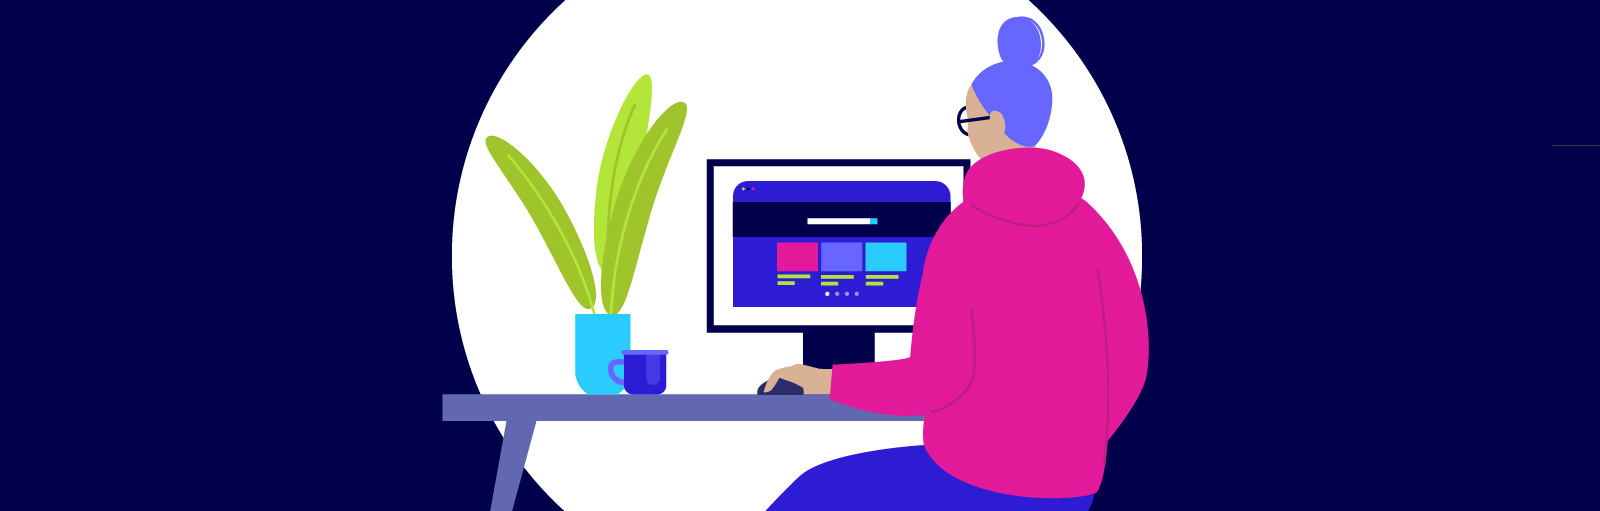 Avoid community manager burnout tipsheet header image